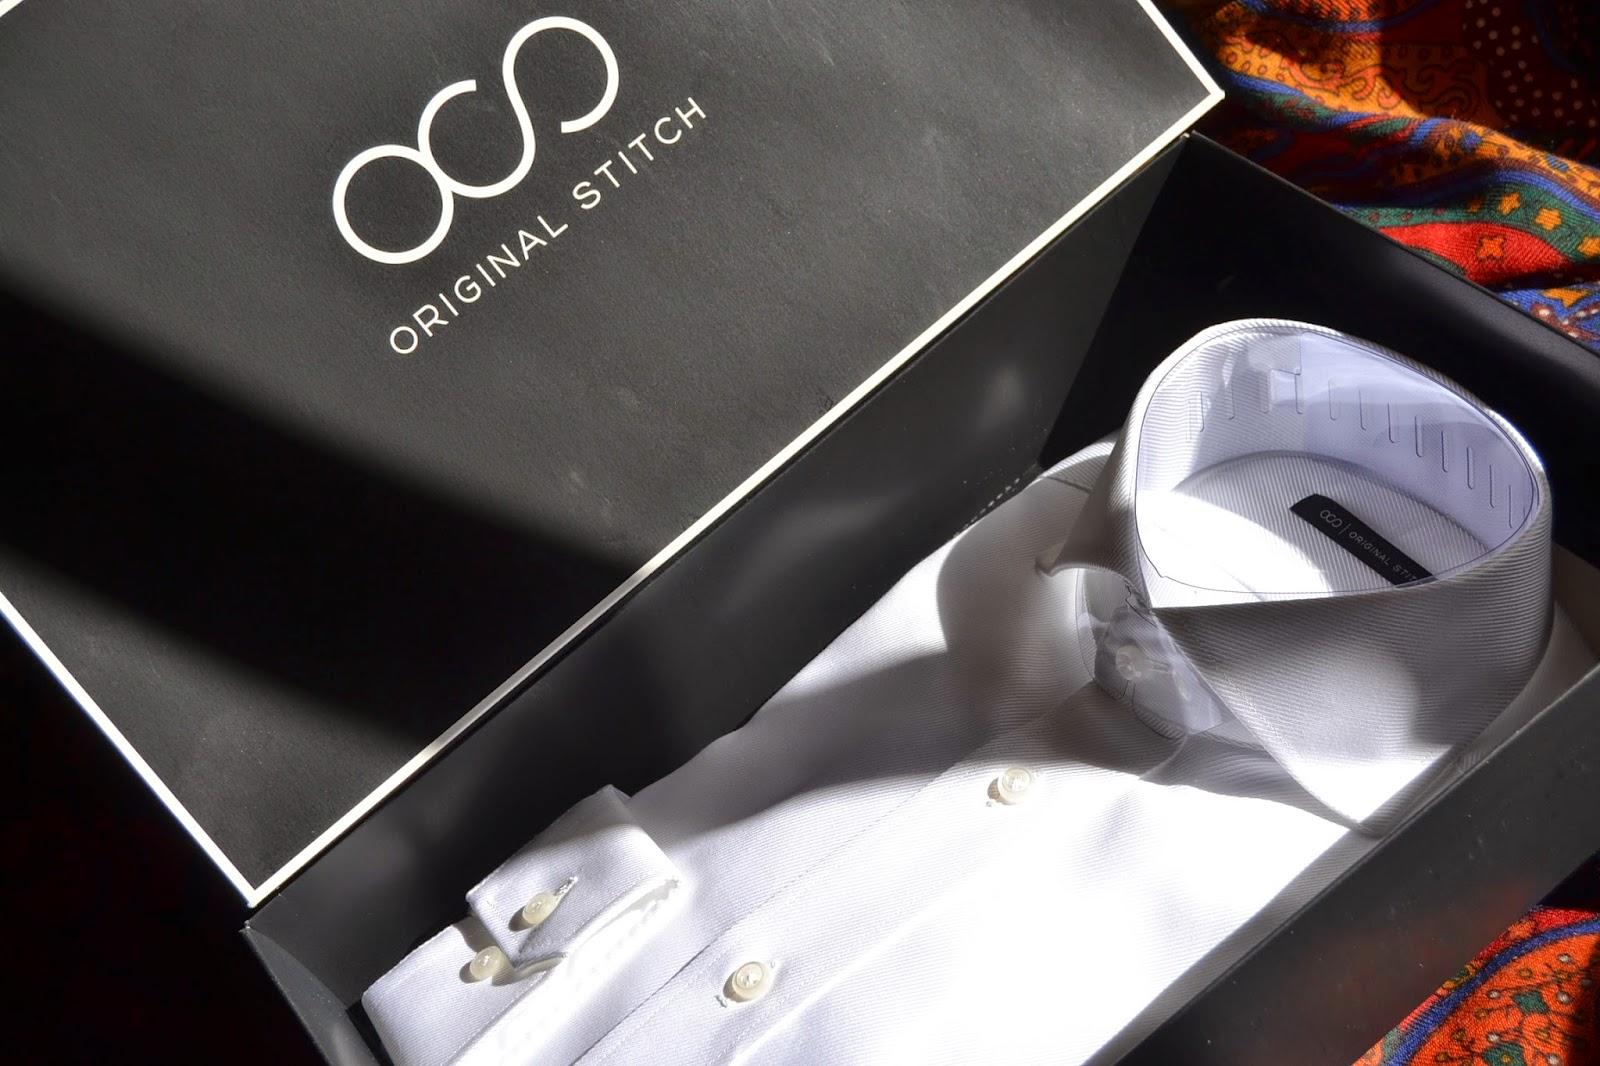 http://www.syriouslyinfashion.com/2015/05/original-stitch-classic-white-shirt.html